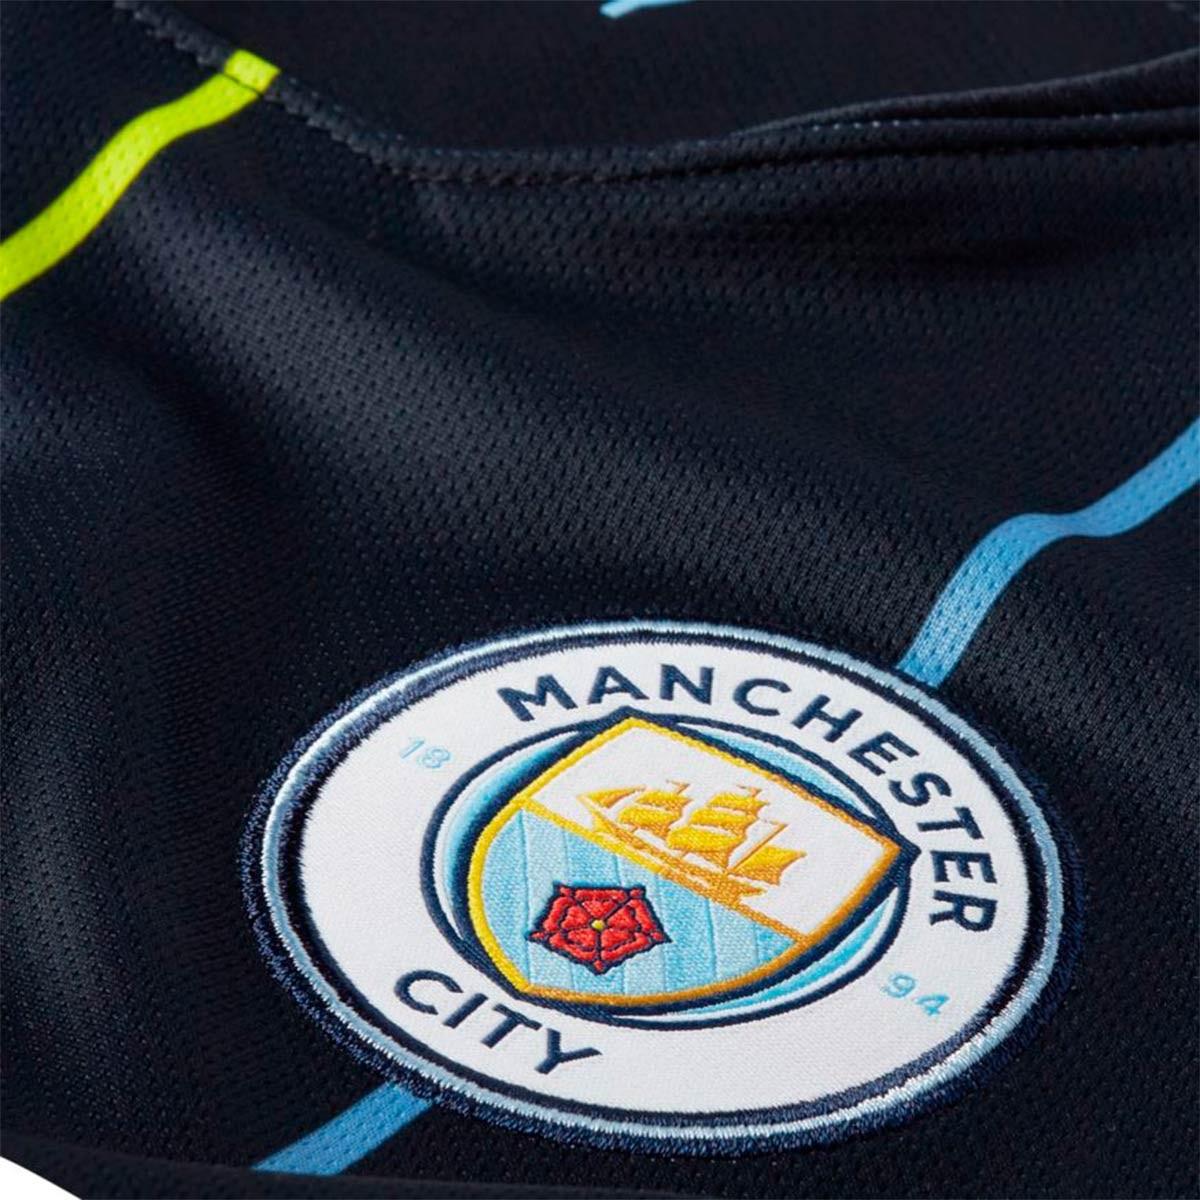 6bb13e23c0 Jersey Nike Kids Manchester City FC Stadium 2018-2019 Away Dark  obsidian-White - Football store Fútbol Emotion